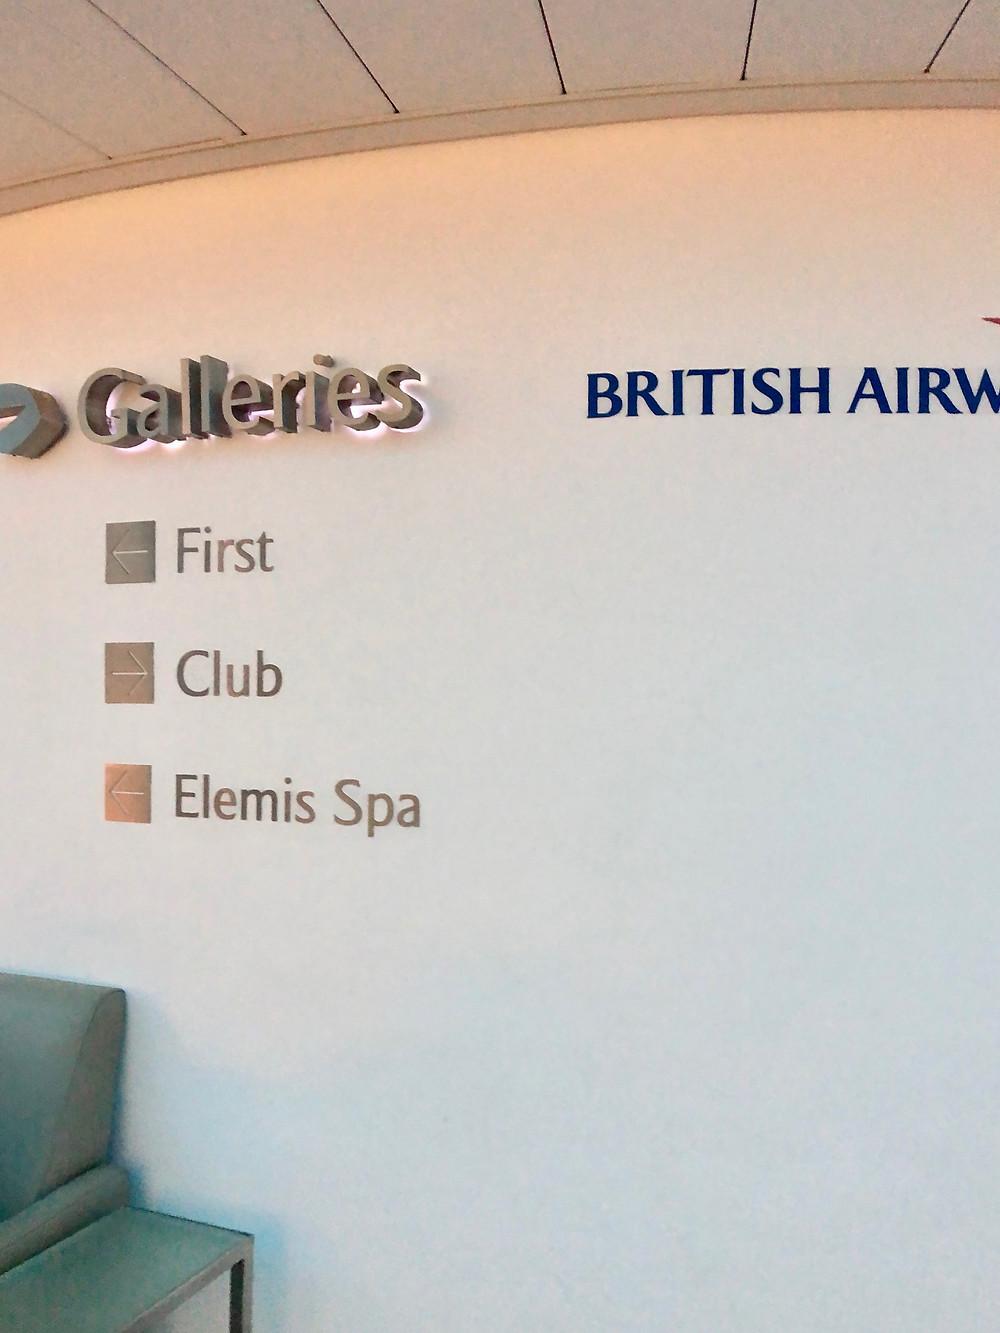 Entrance to the Elemis Spa at the Heathrow BA Lounge